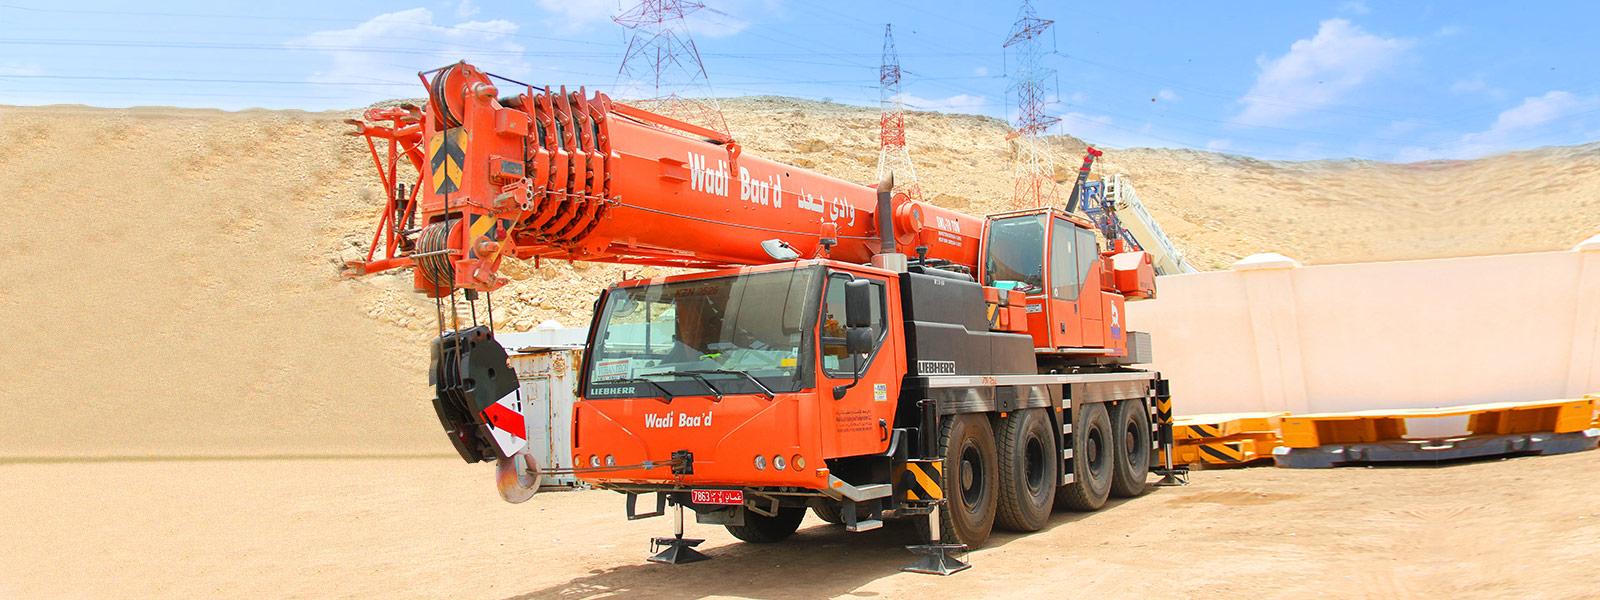 Crane Rental & Hiring Company Oman | Mobile Cranes, Rough Terrain